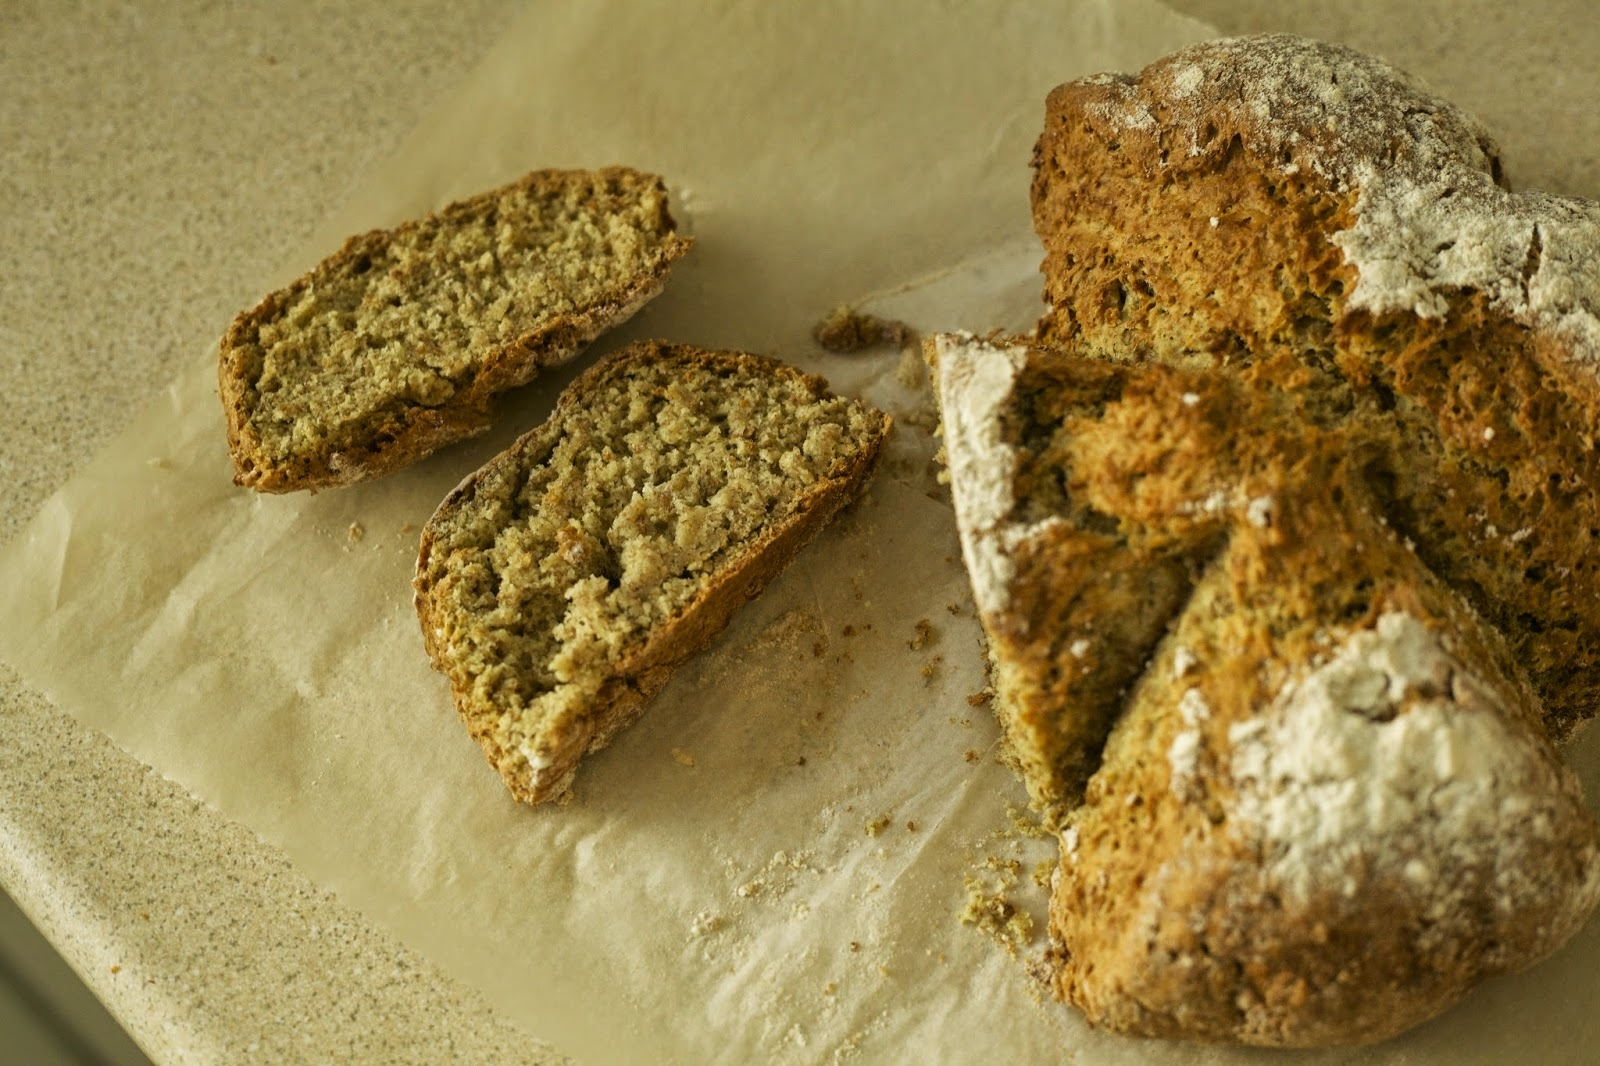 Irsky sodovy chlieb (Irish soda bread )